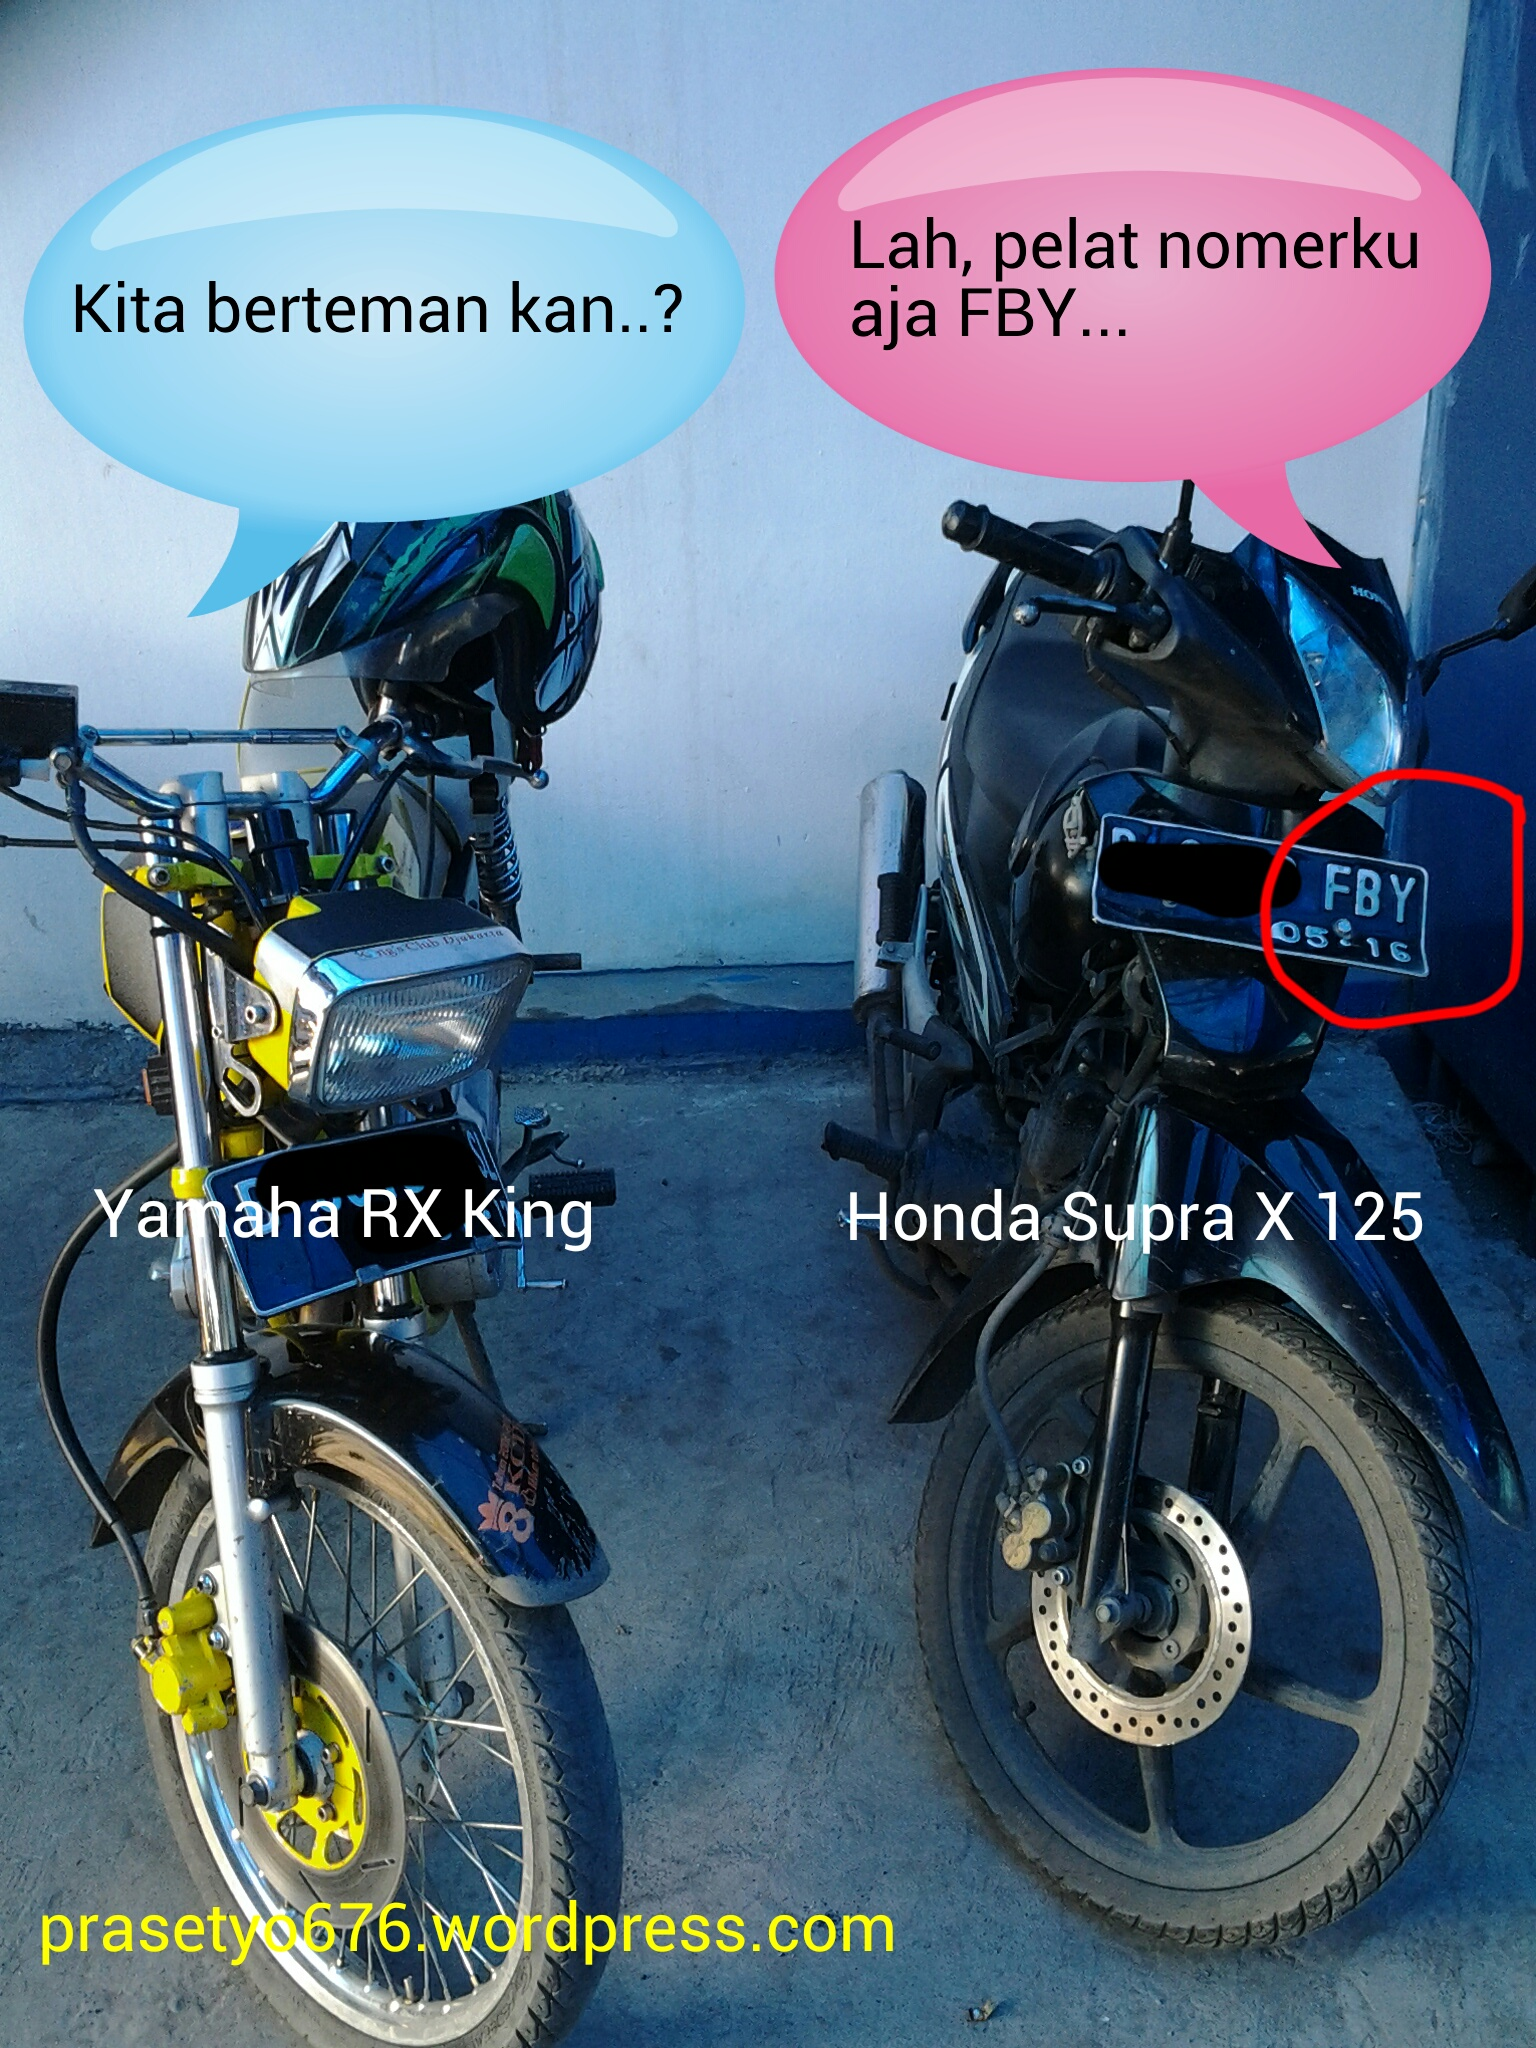 Saat Motor Legendaris Dari Honda Dan Yamaha Bersanding